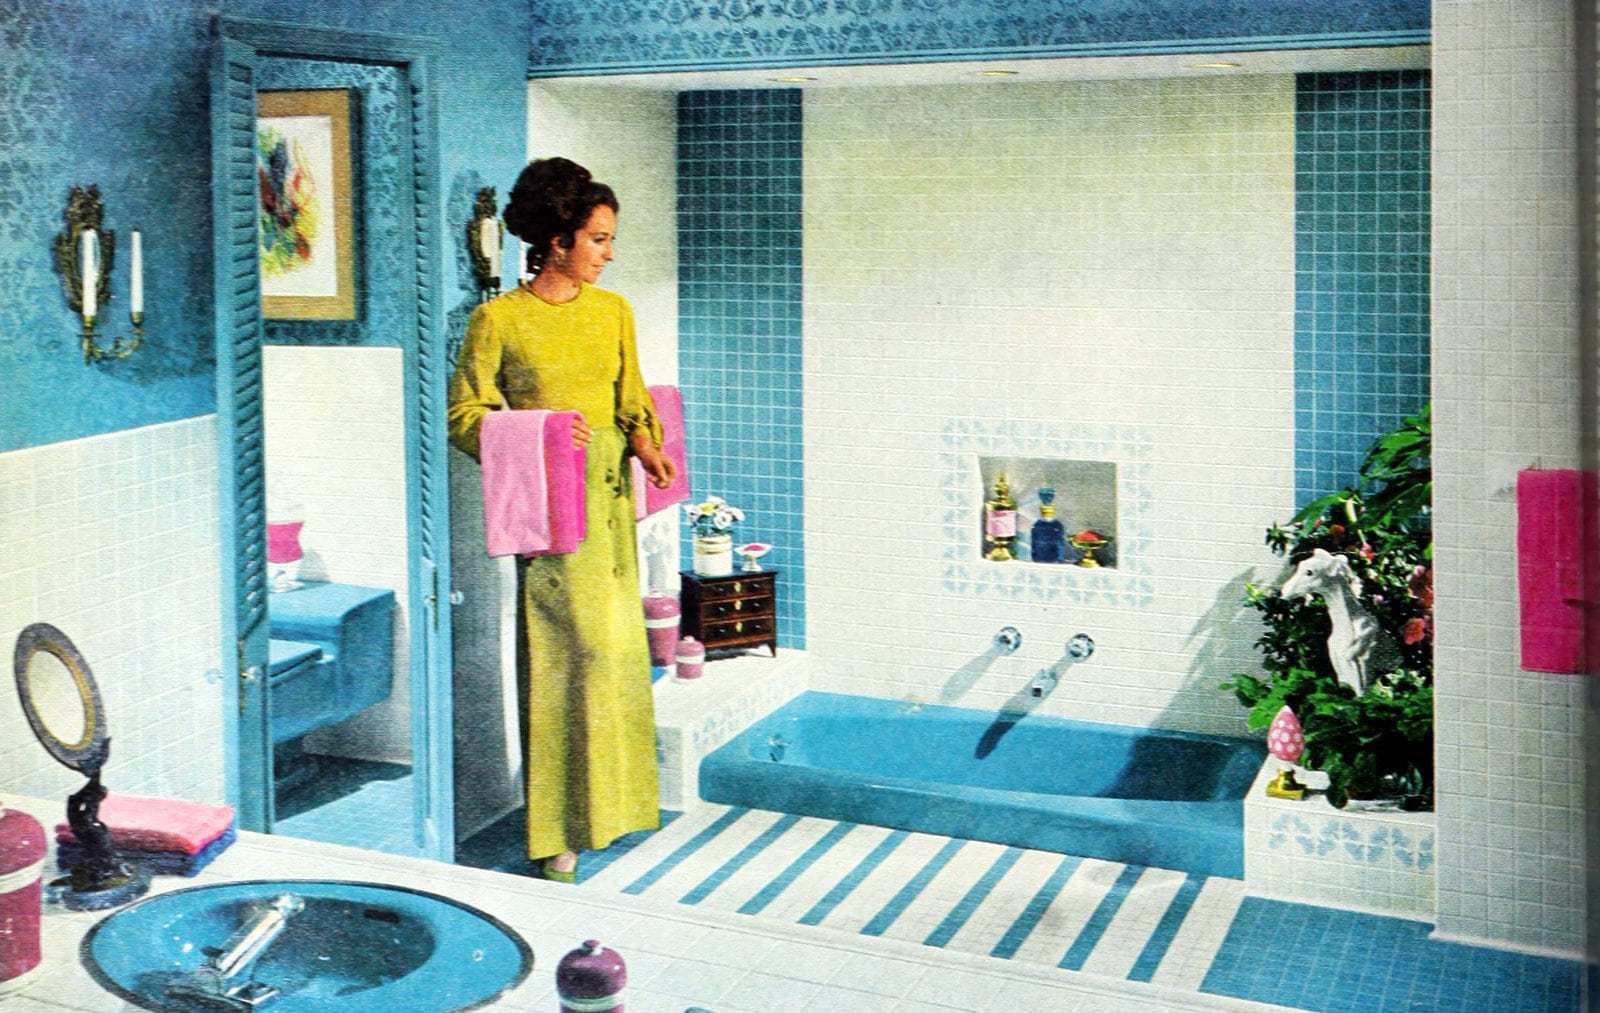 Bright blue tiled vintage 60s bathroom decor (1969)